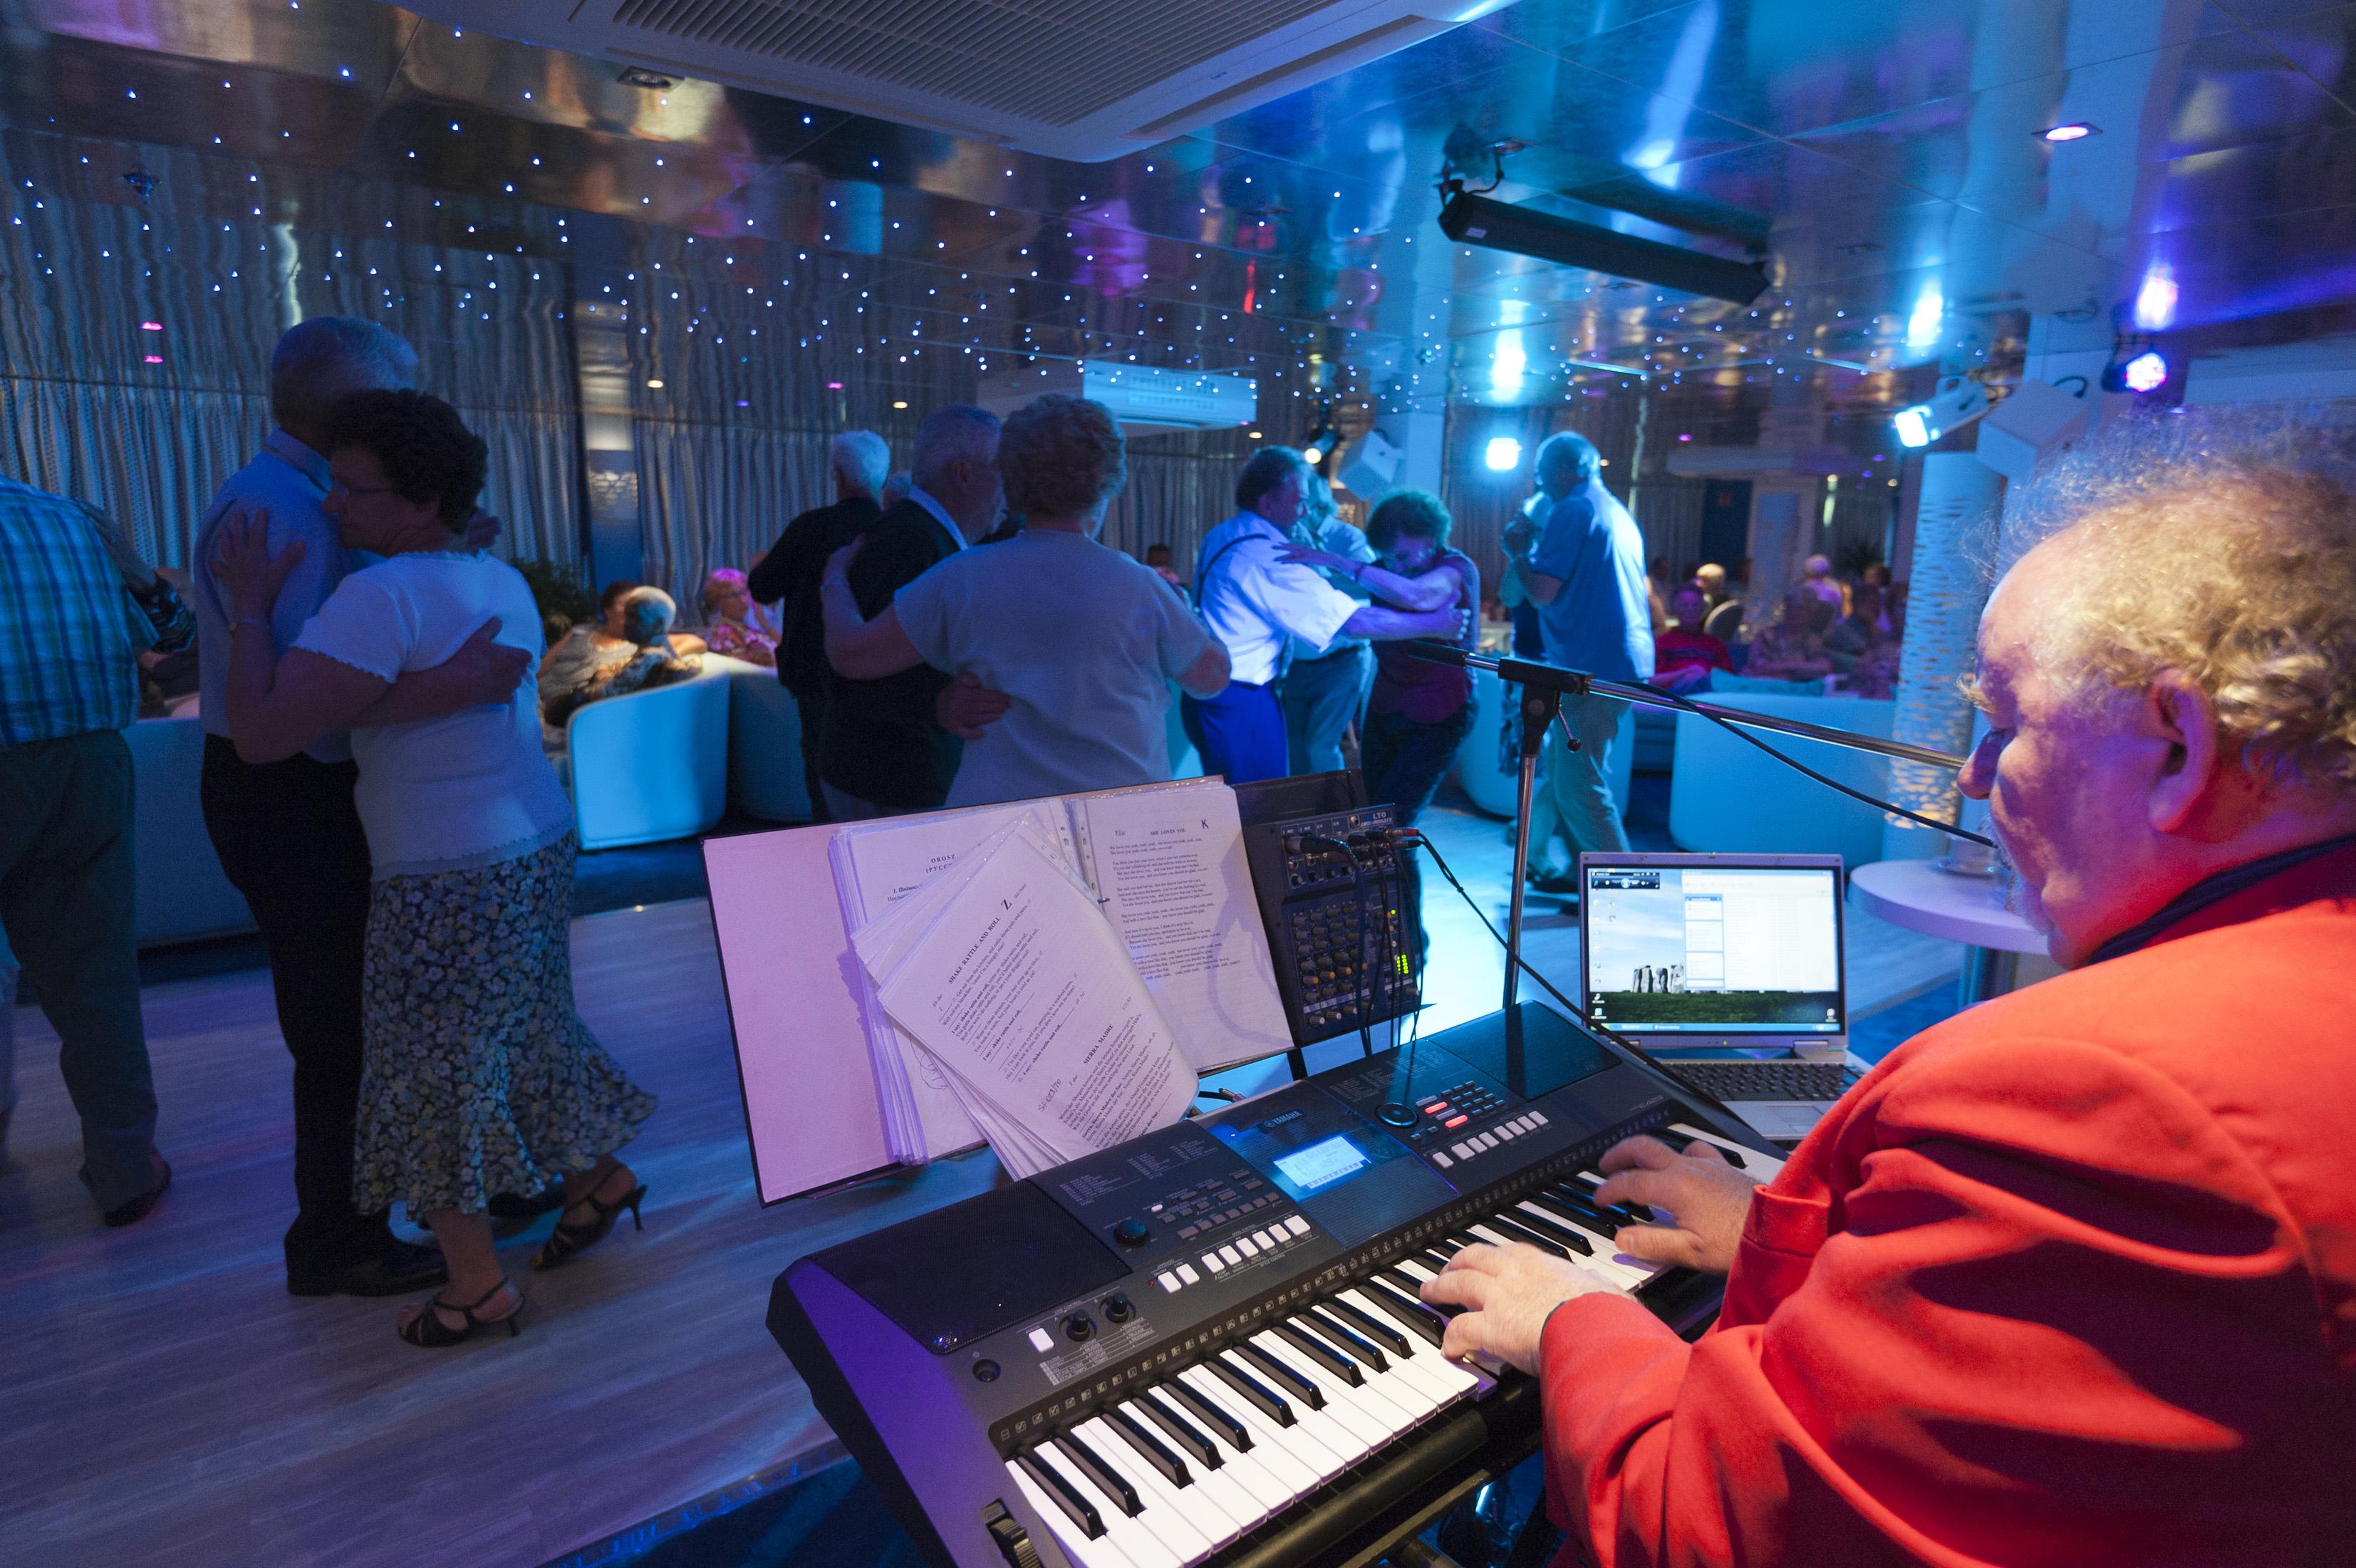 CroisiEurope MS Cyrano de Bergerac Interior Lounge Bar Entertainment.jpg